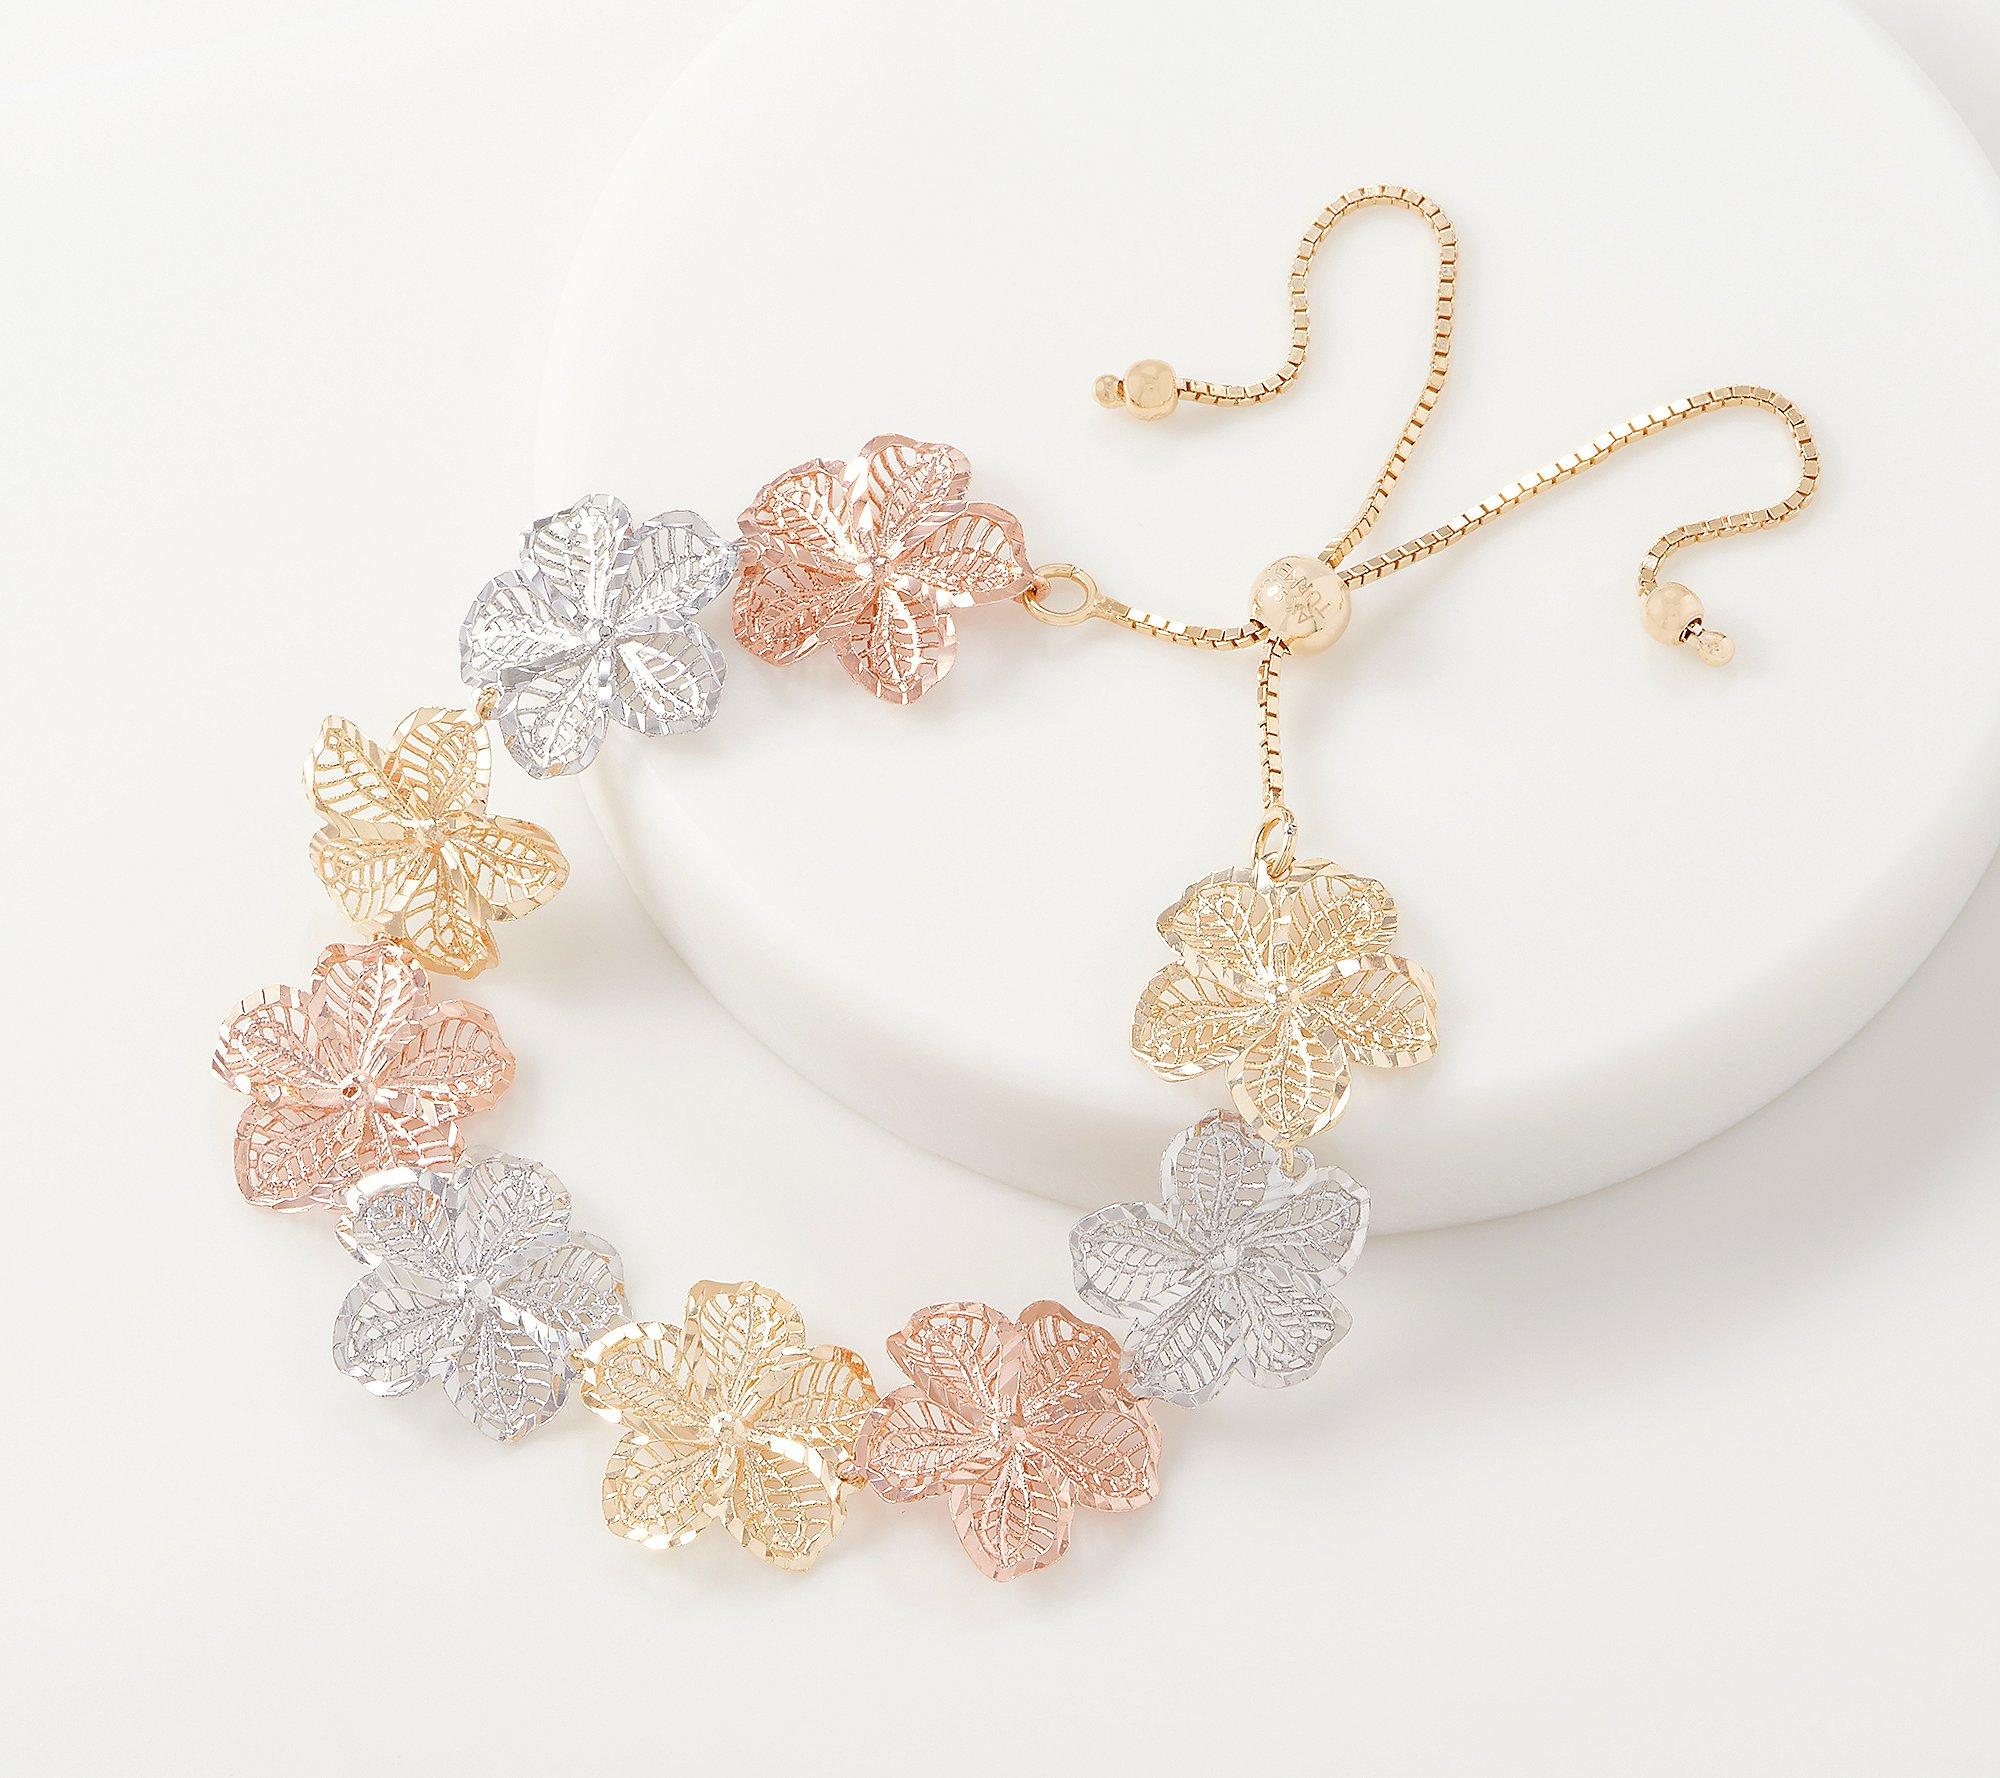 Infinity bracelet gold plated cubic zirconia bracelet in gold plated sterling silver delicate dainty multi strand adjustable bracelet